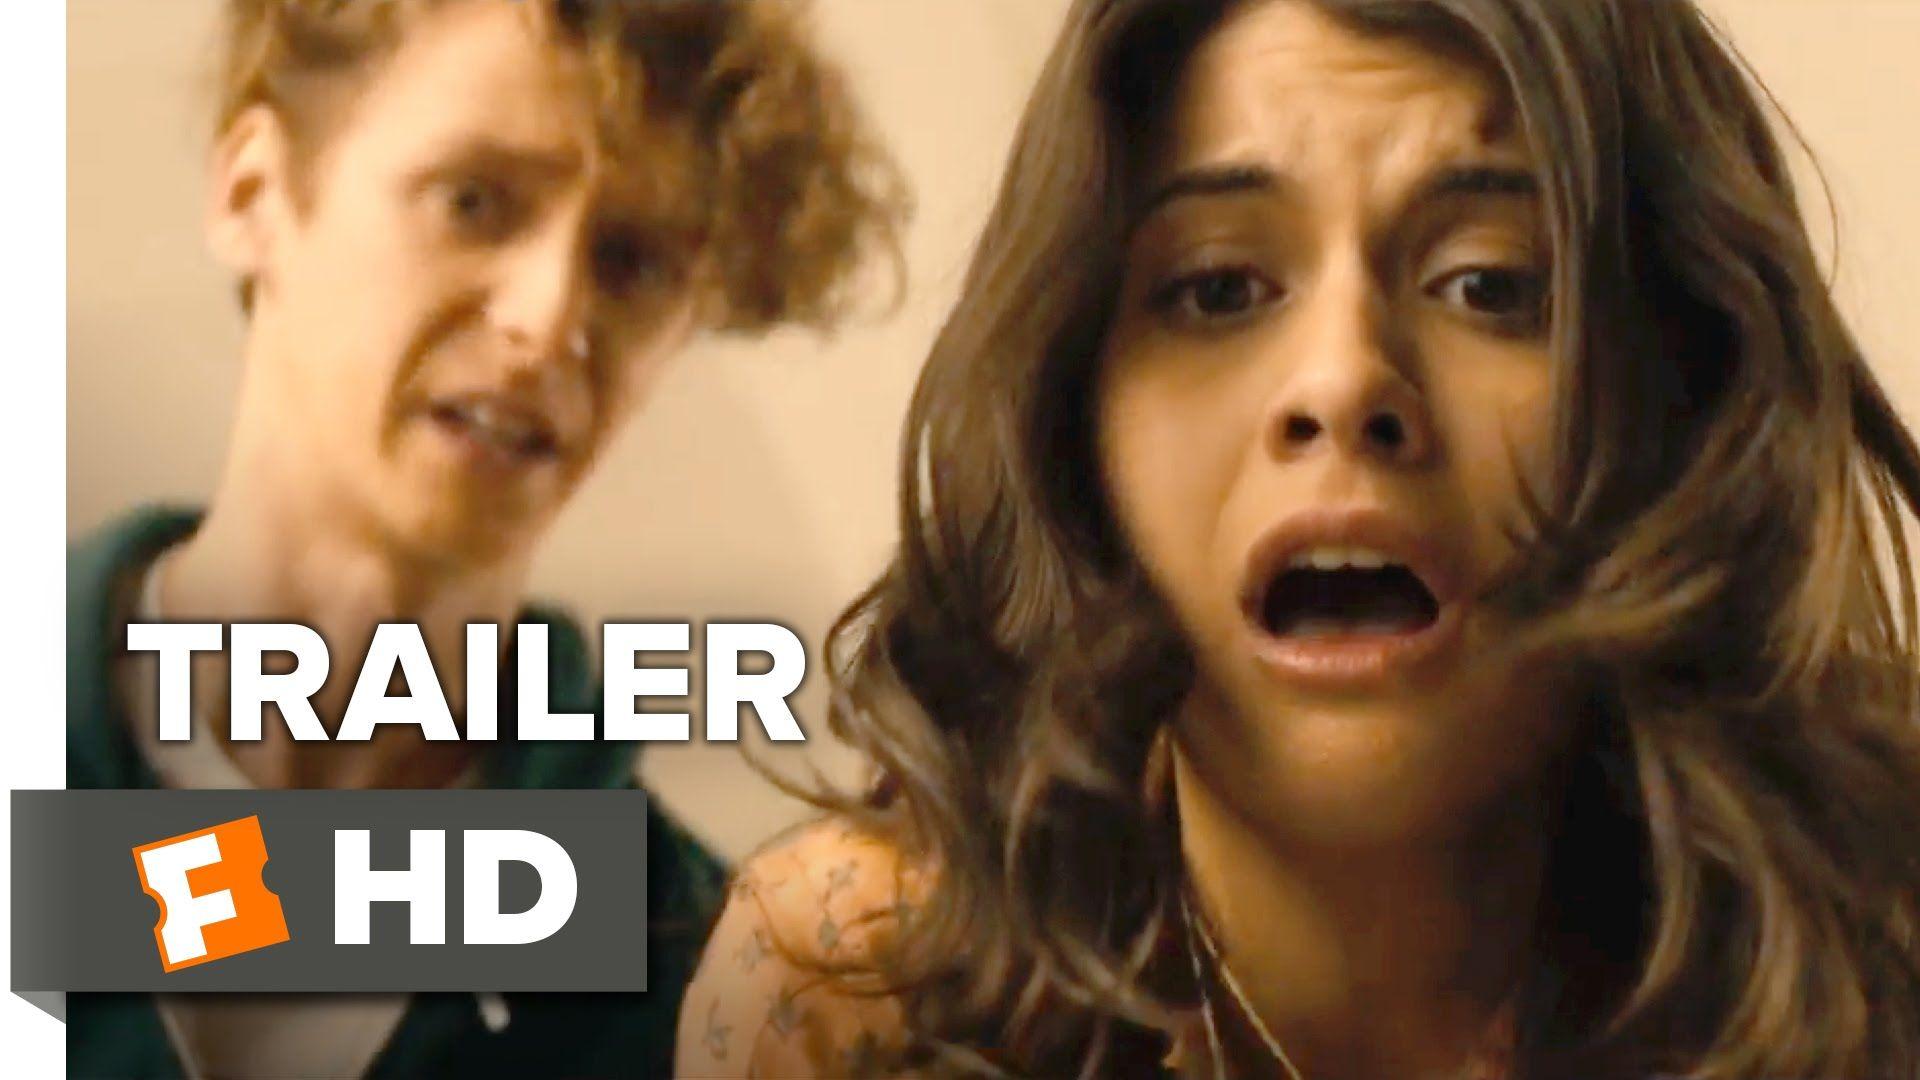 Analeigh Tipton Sex viral official trailer 1 (2016) - analeigh tipton movie just